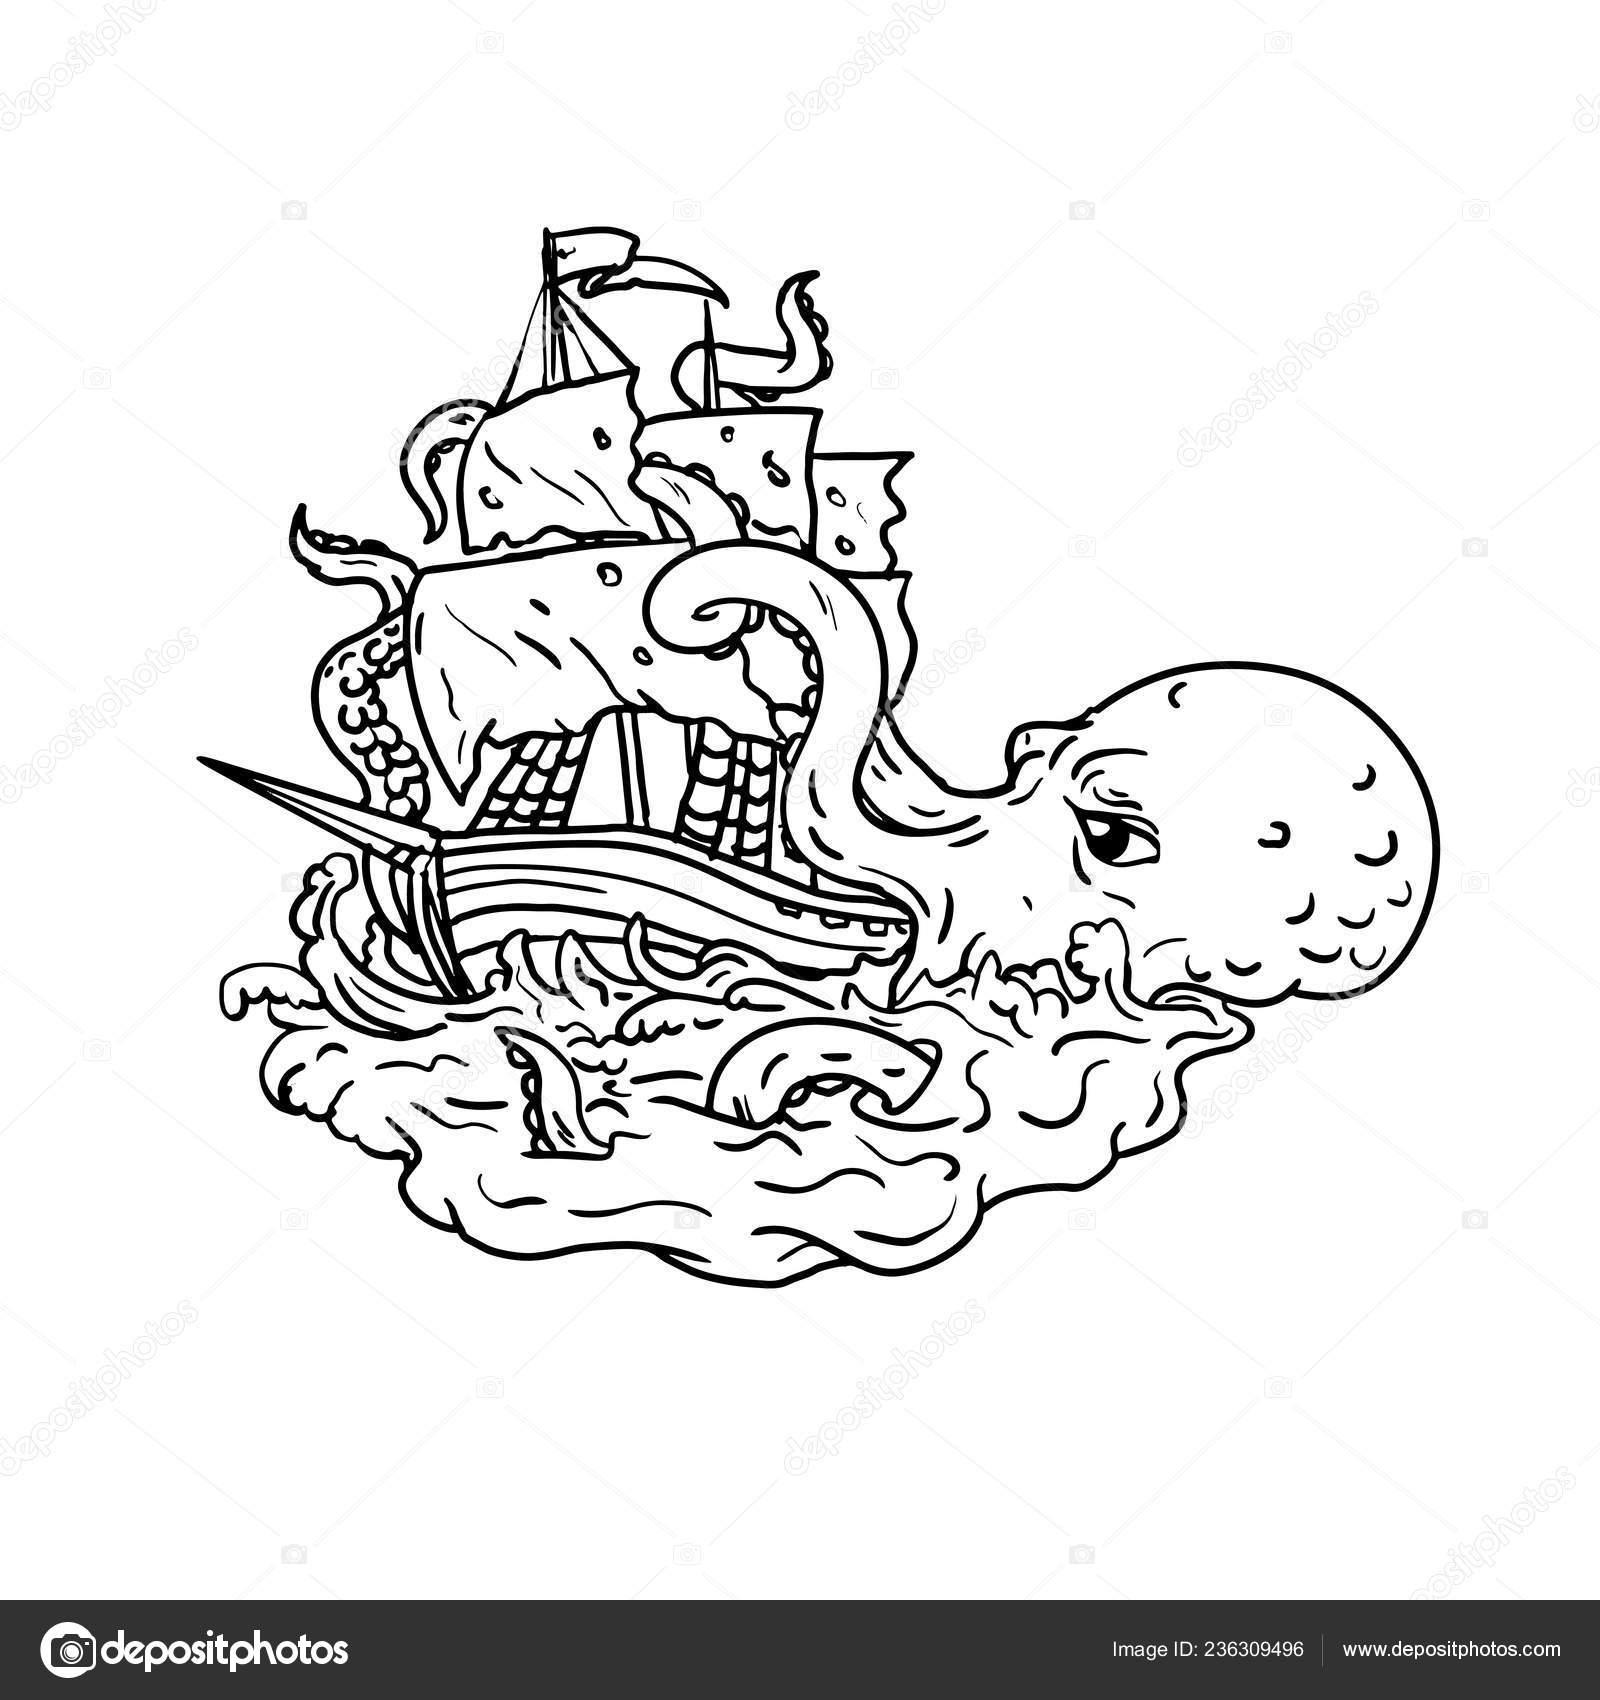 Doodle Ilustración Arte Kraken Monstruo Mar Gigante Legendario